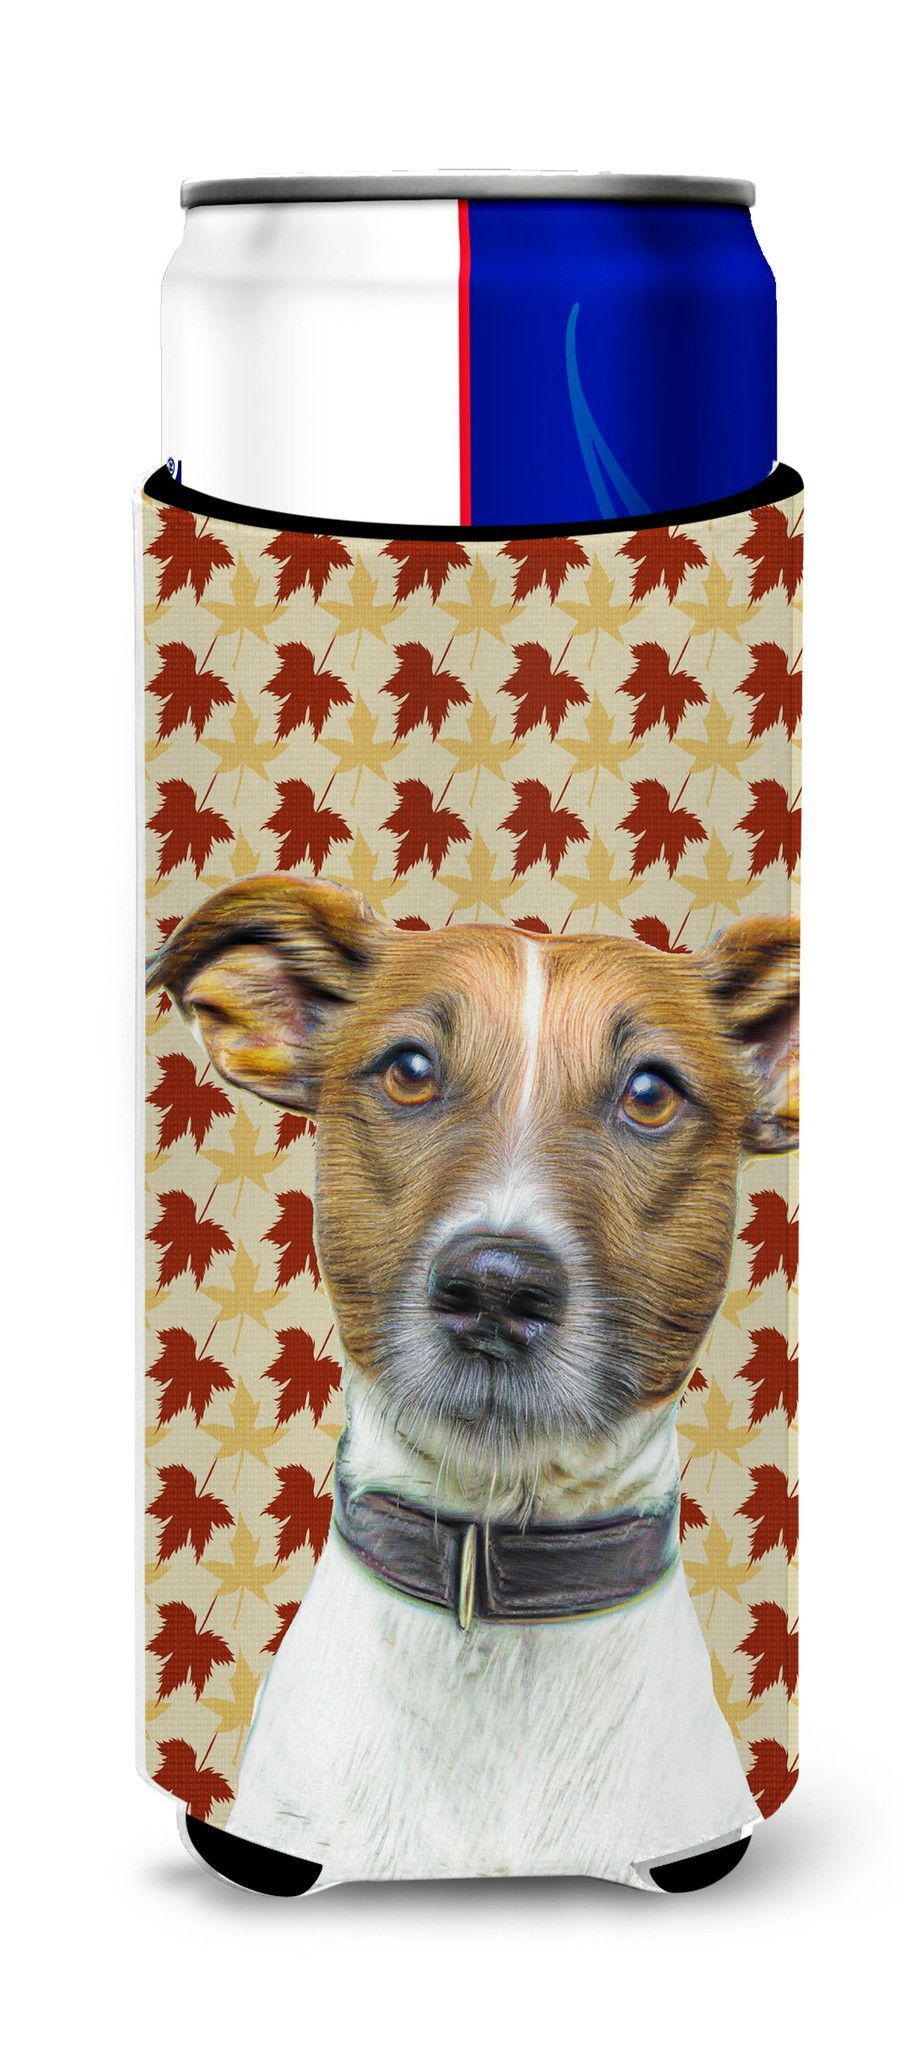 Fall Leaves Jack Russell Terrier Ultra Beverage Insulators for slim cans KJ1204MUK